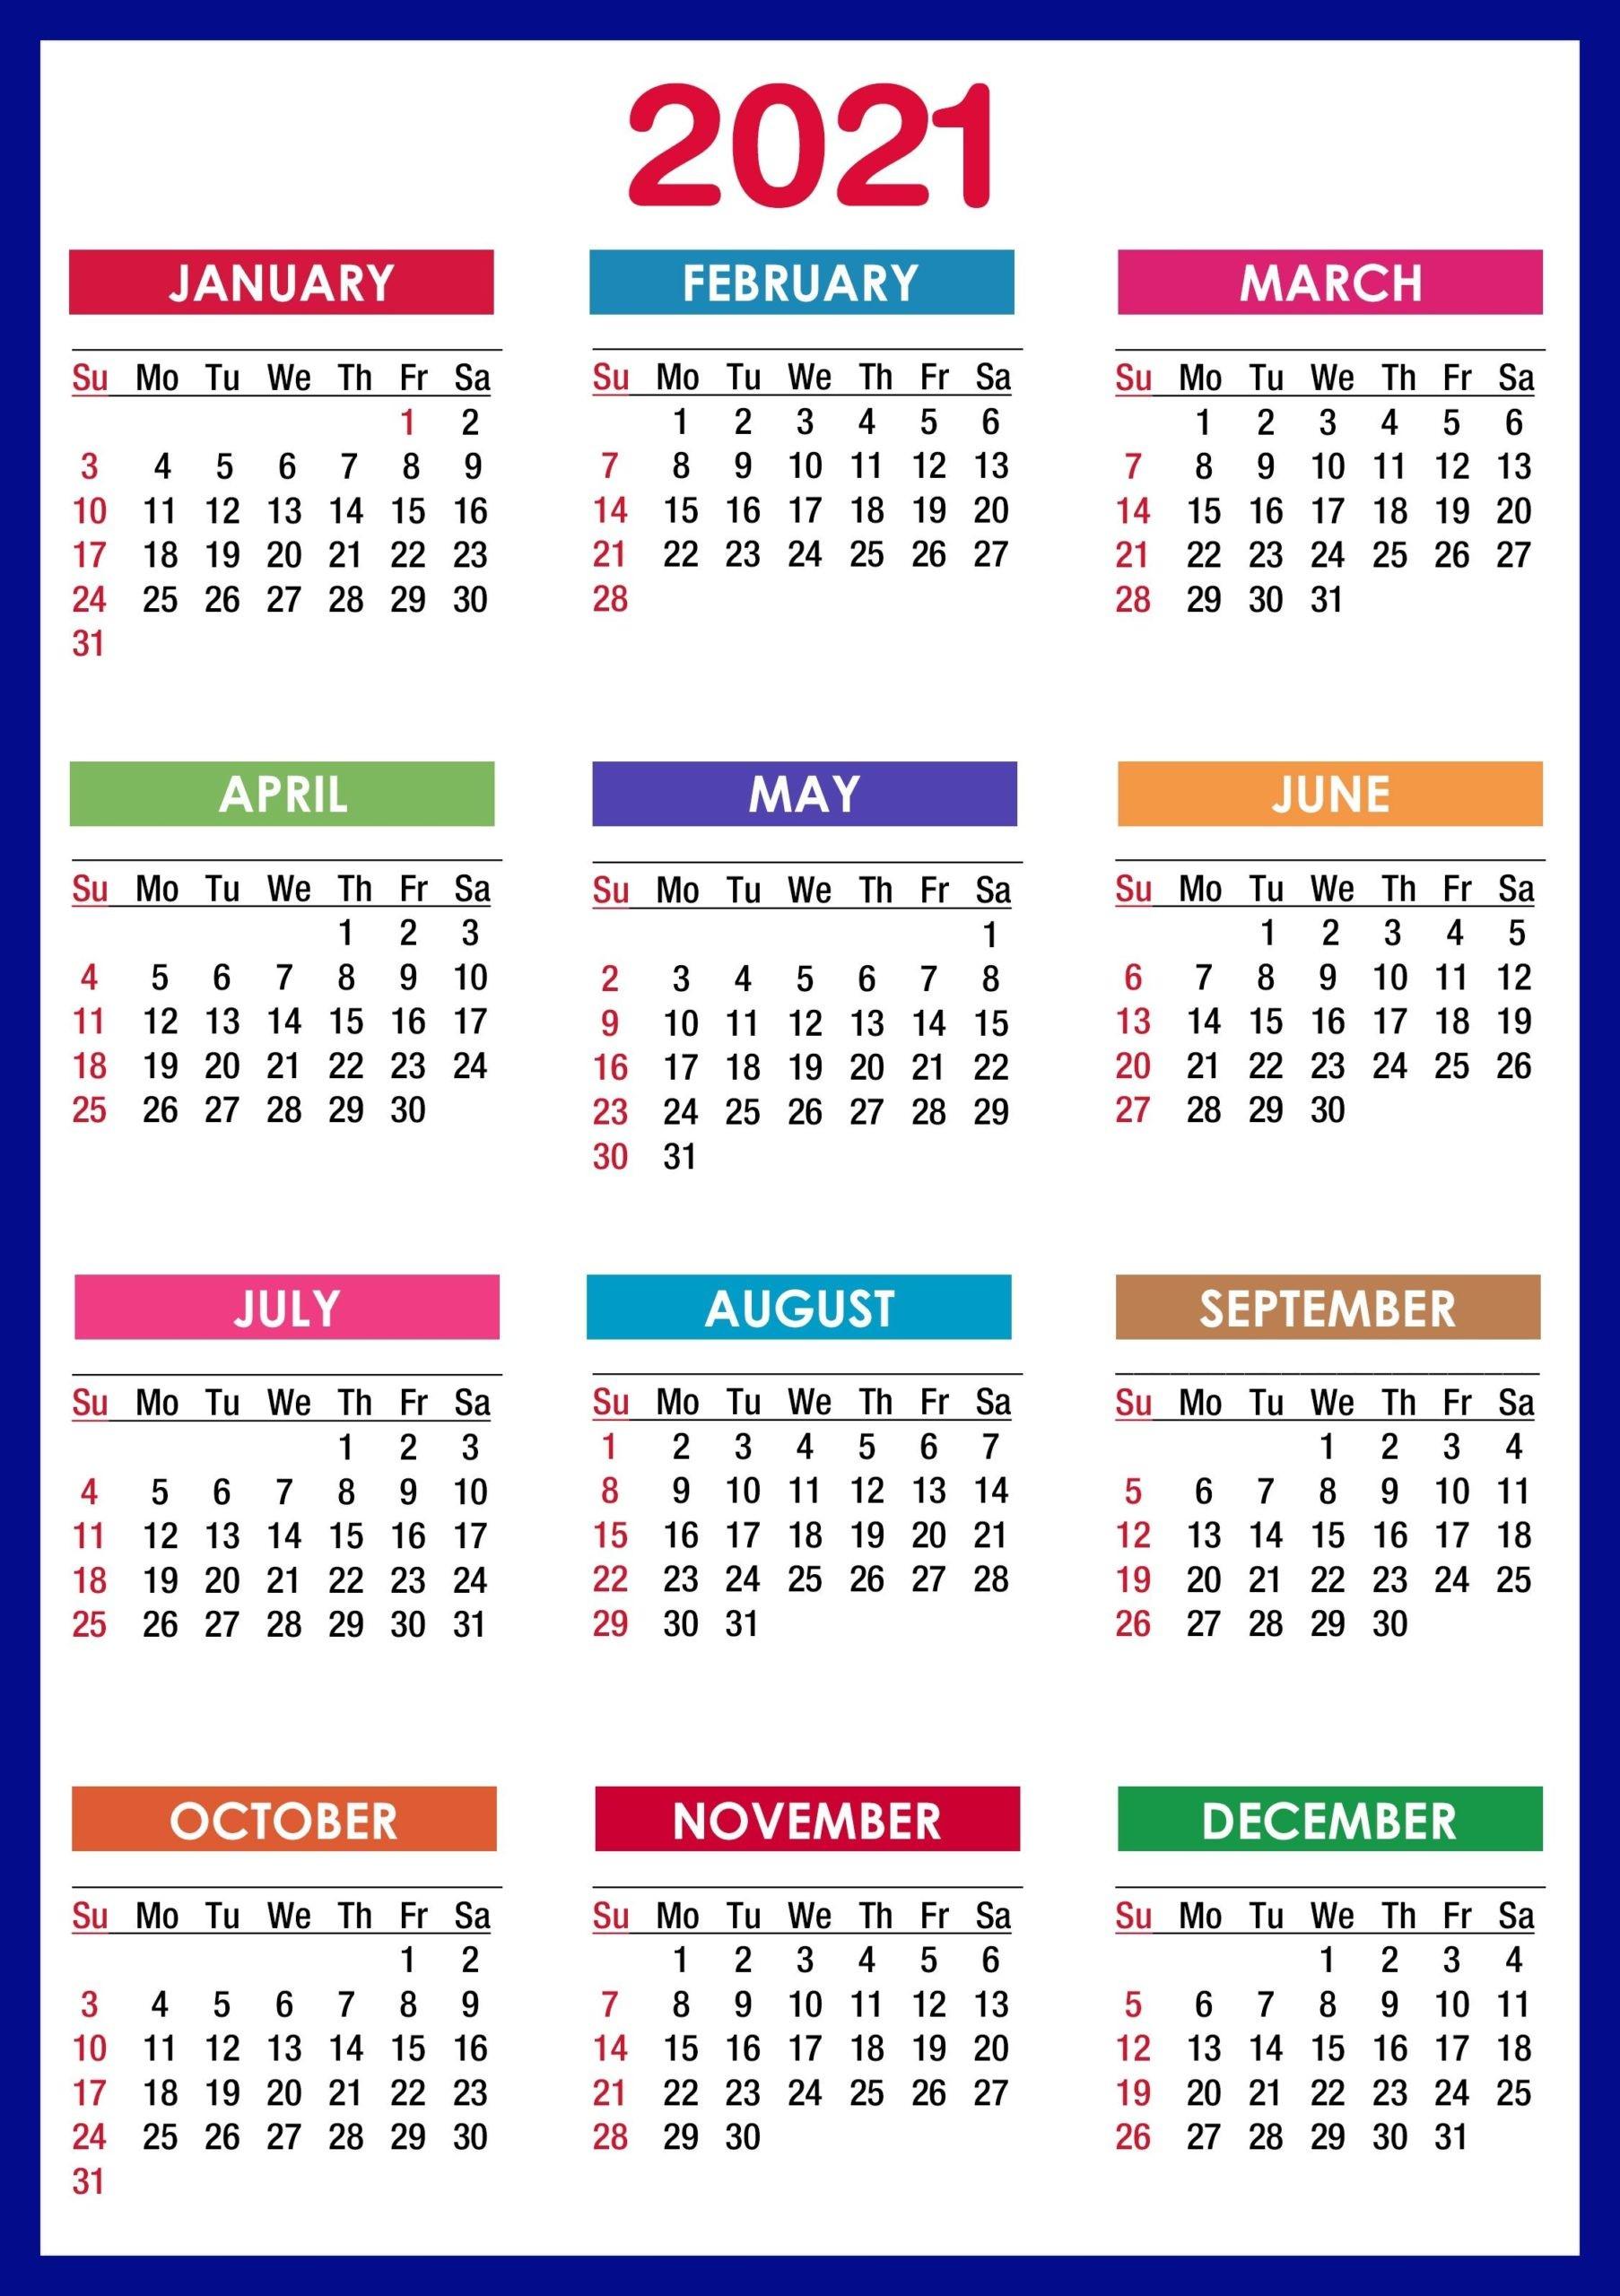 2021 Calendar Printable 12 Months All in e